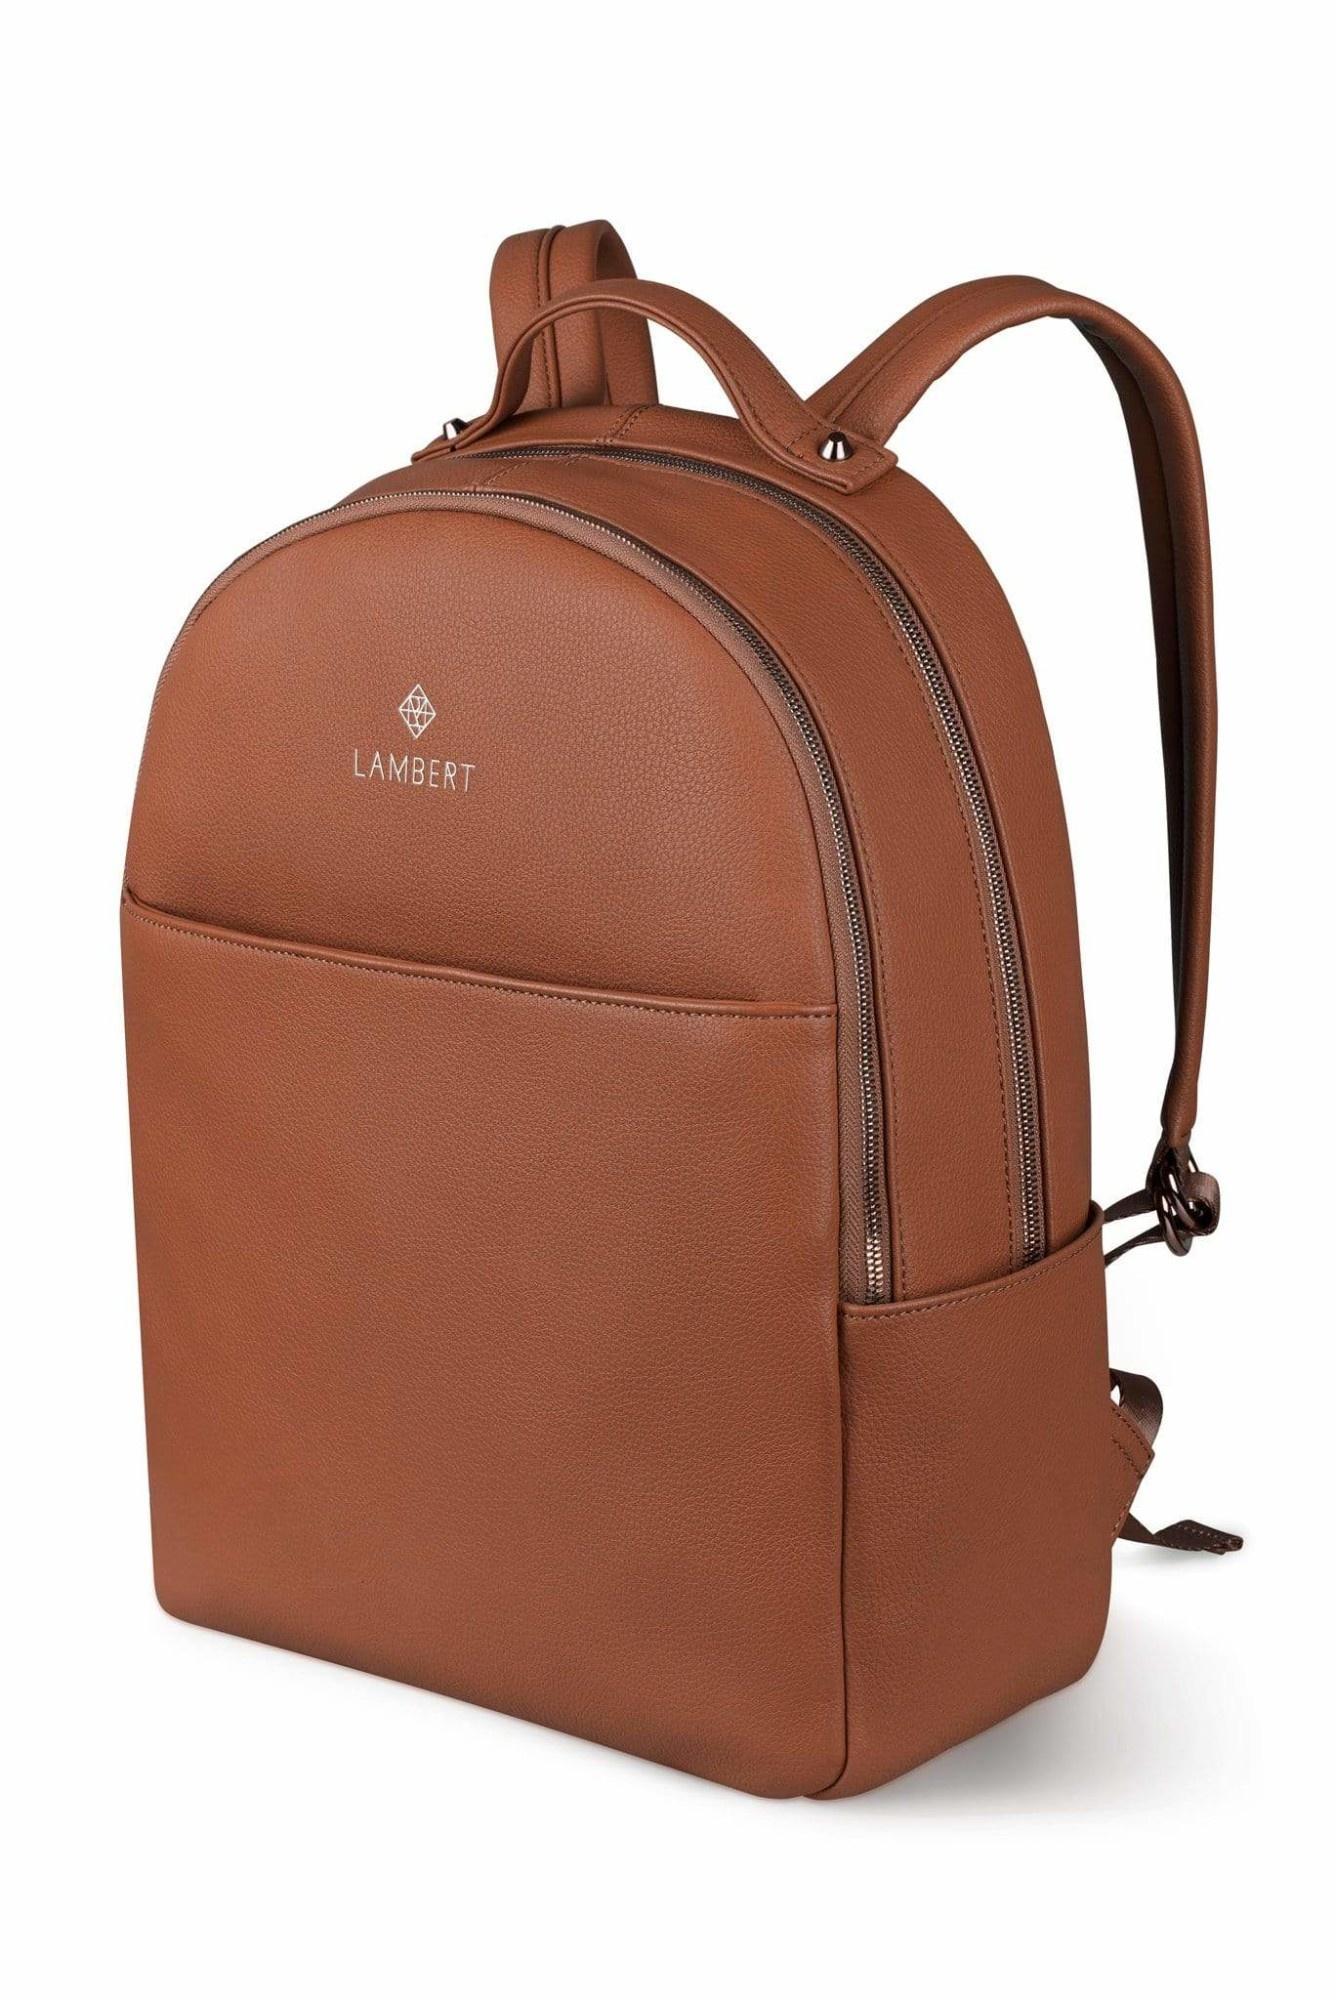 Lambert CHARLOTTE - Sac à dos en cuir vegan tan pour femme